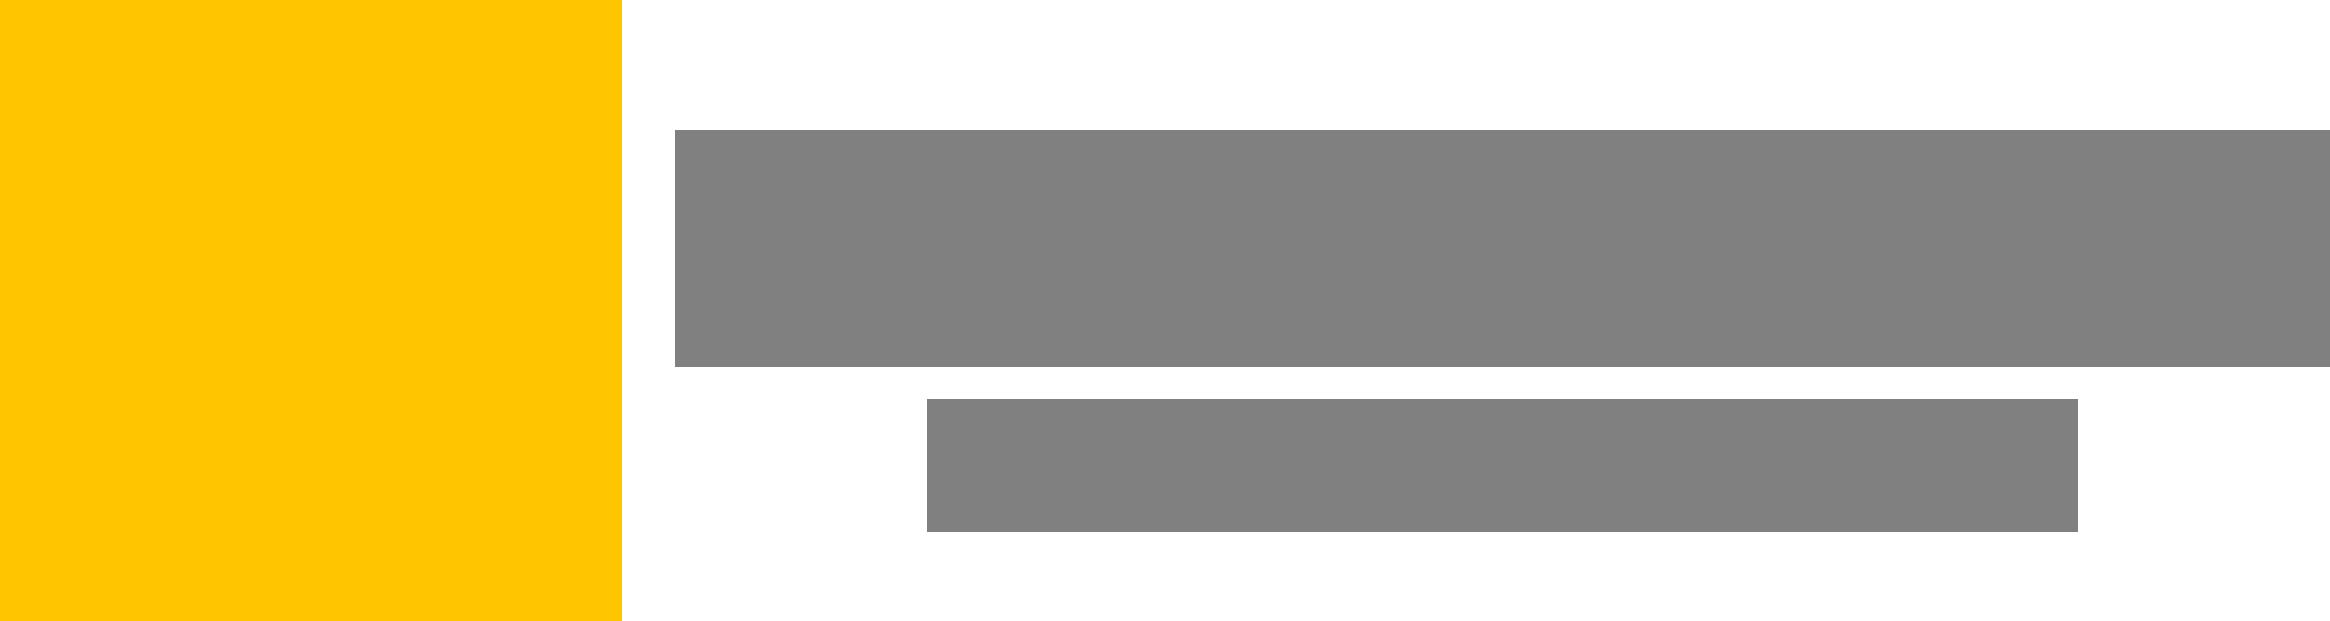 hearndon-heights-logo